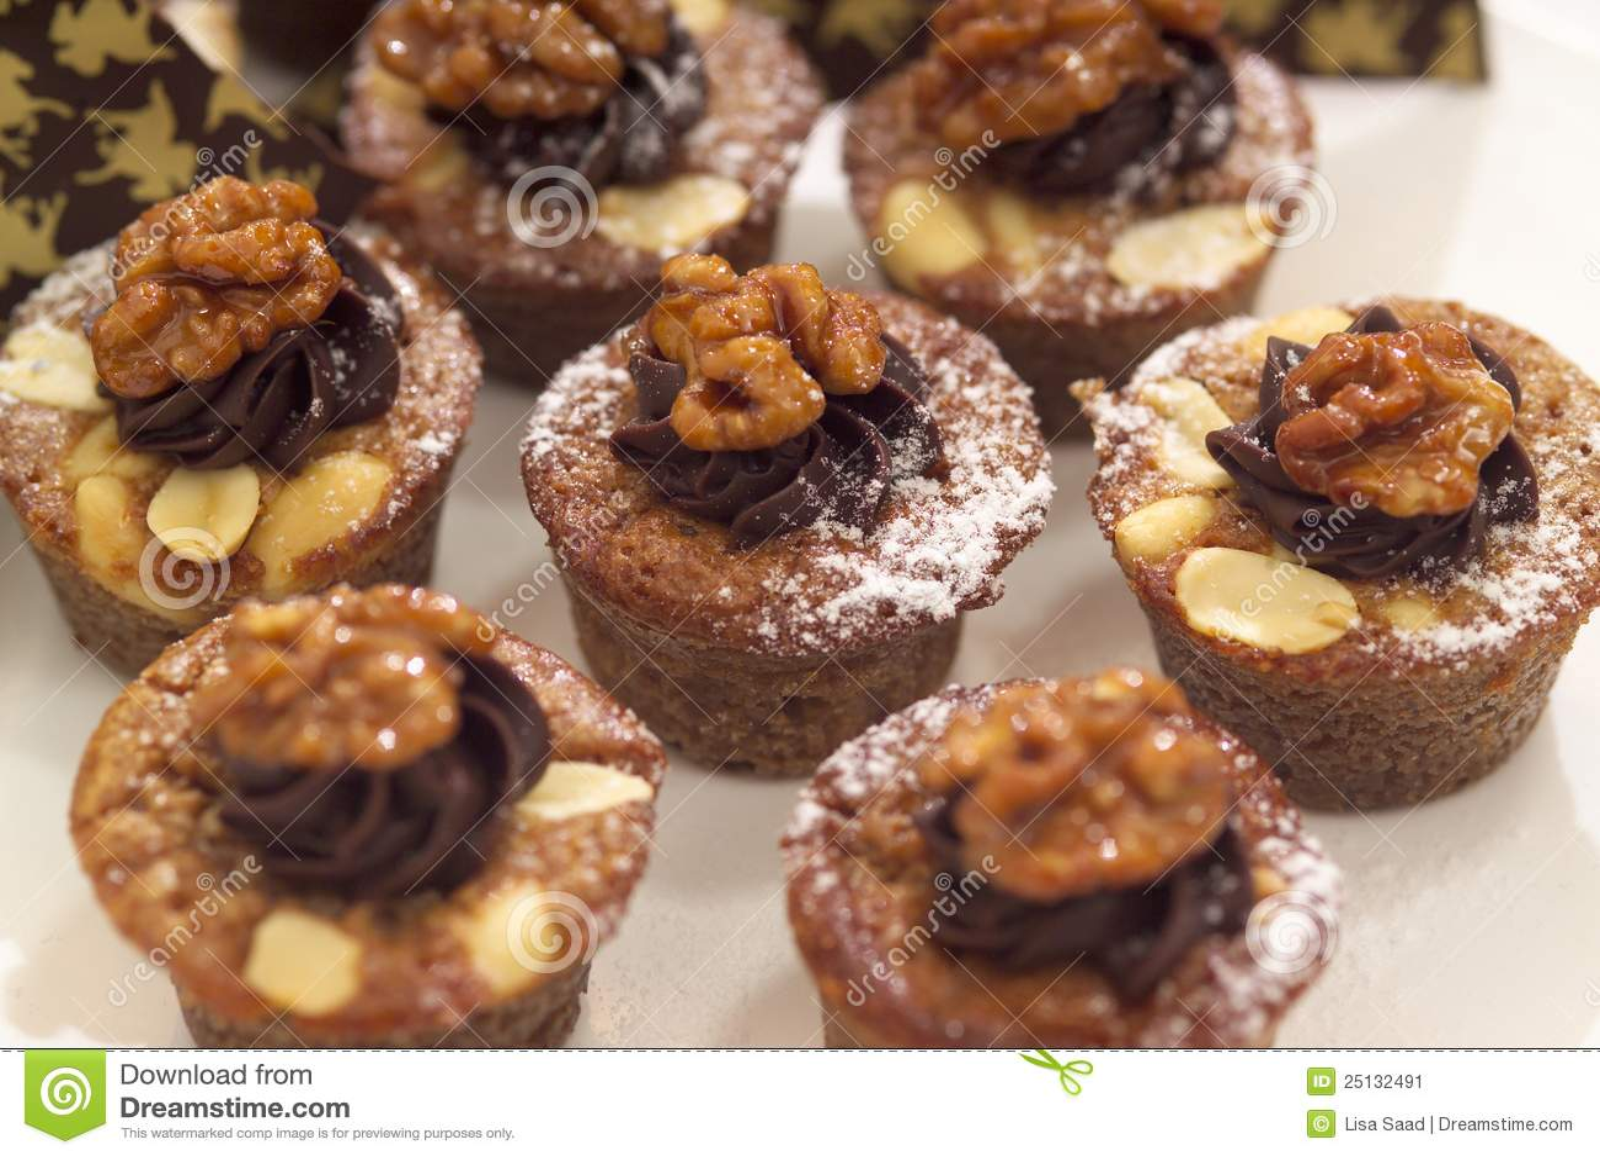 Walnut and chocolate muffins